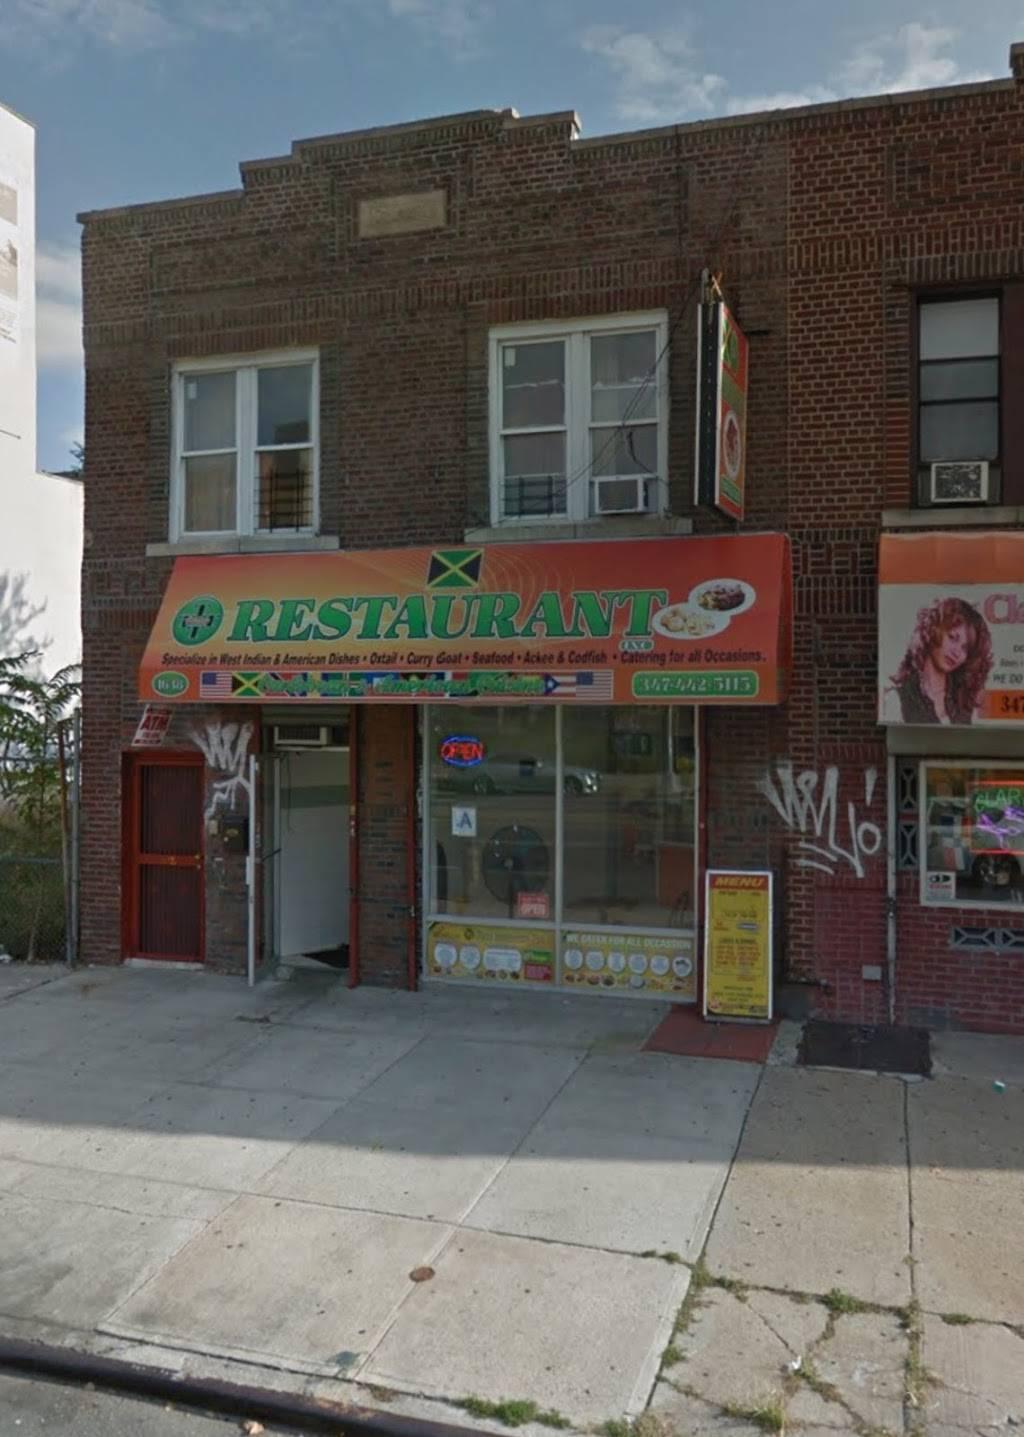 Real jamaican food   restaurant   1638 Eastern Pkwy, Brooklyn, NY 11233, USA   3474425115 OR +1 347-442-5115